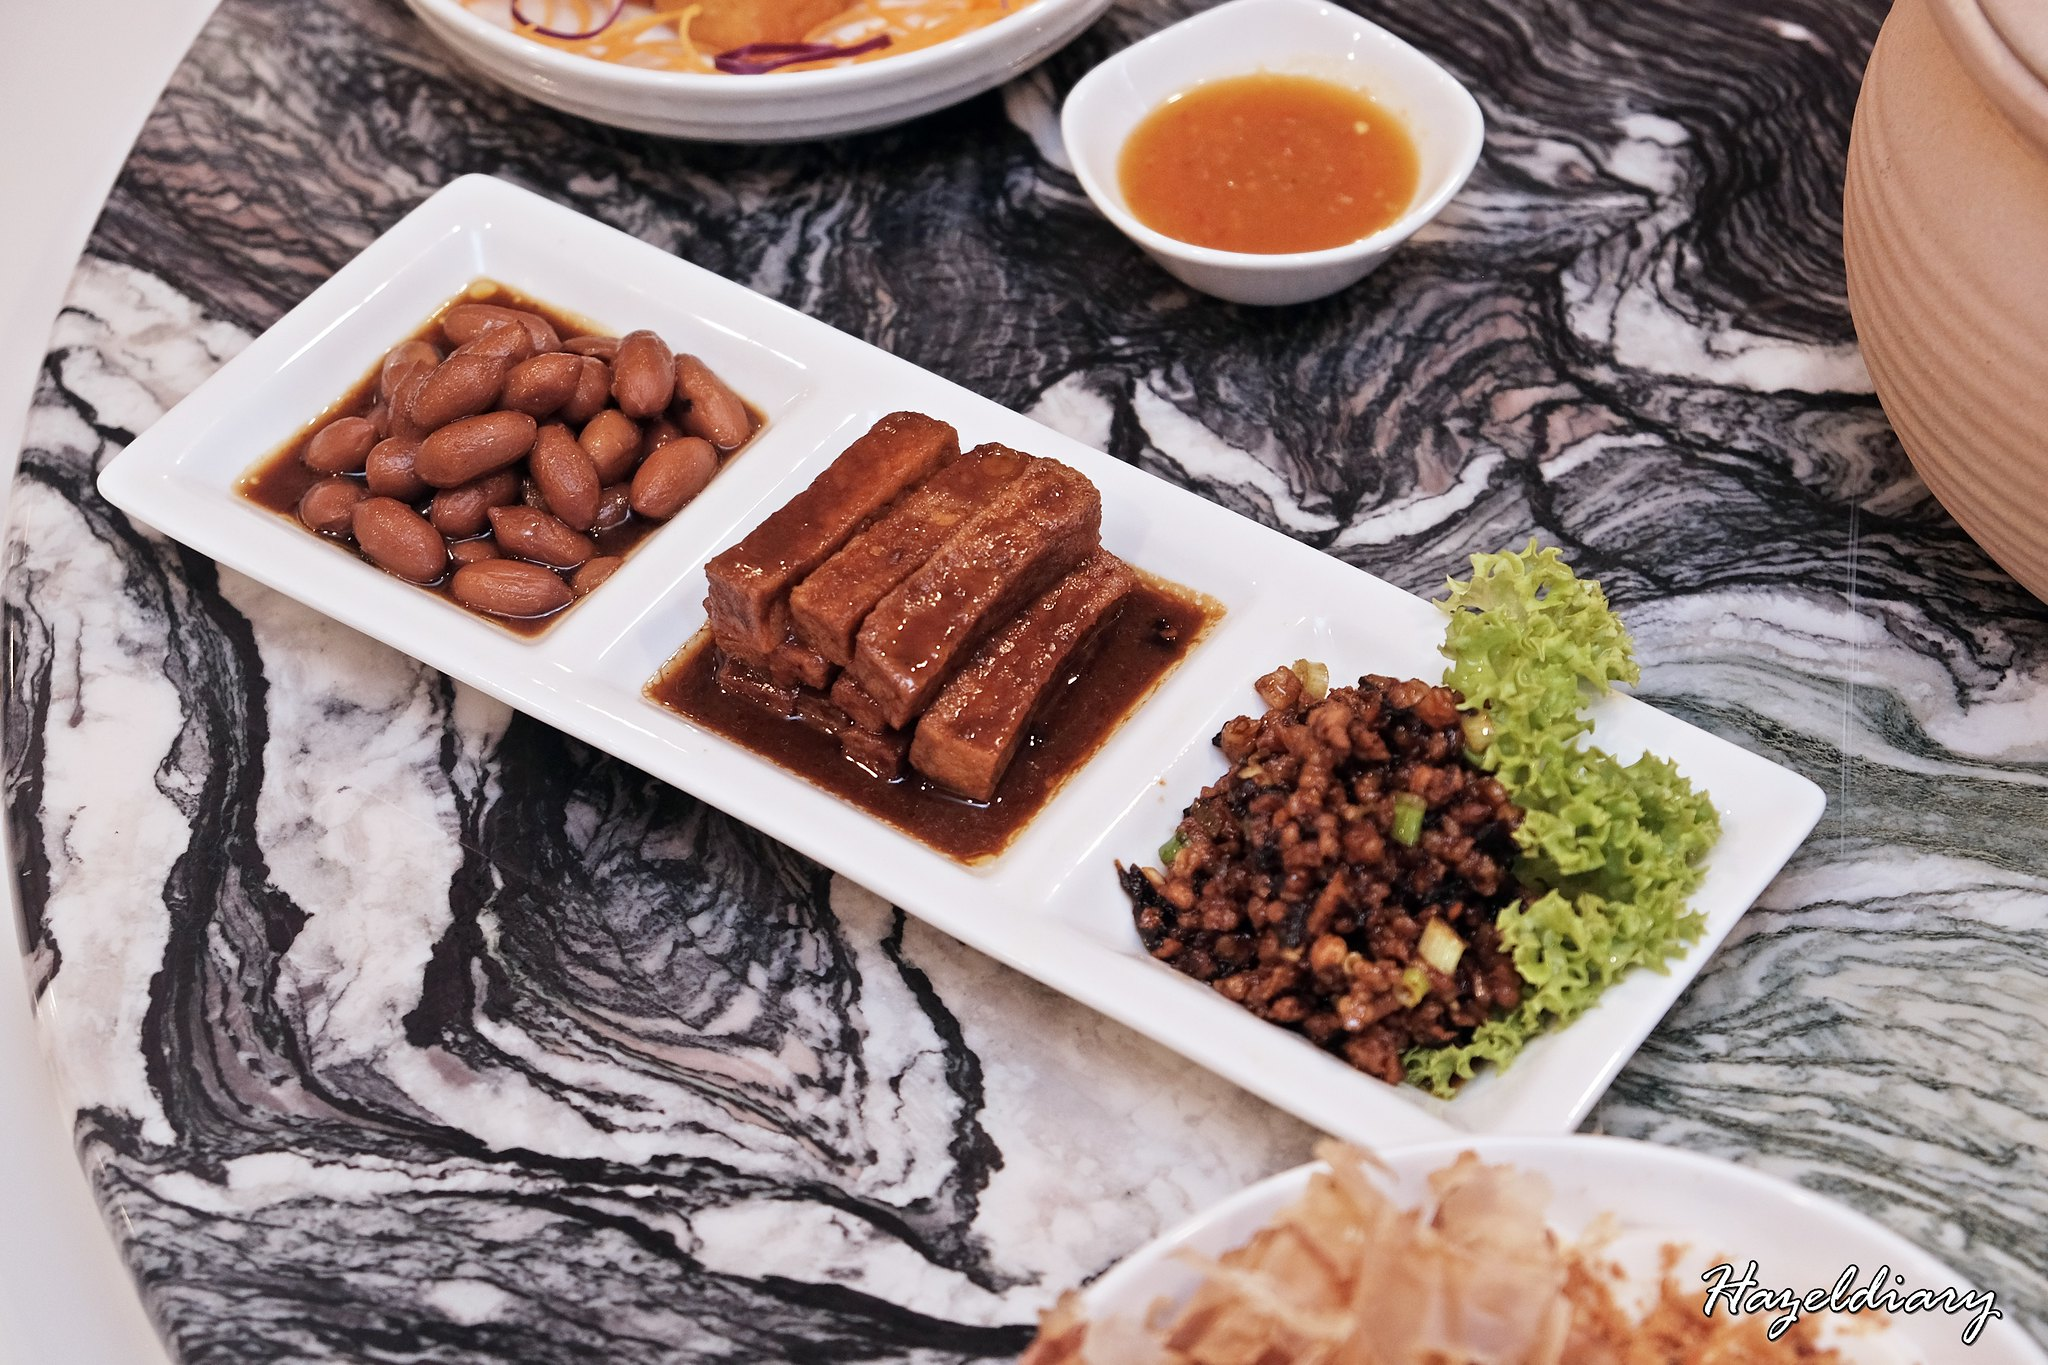 Goldleaf Katong Square-Ah Ma's Tri Platter